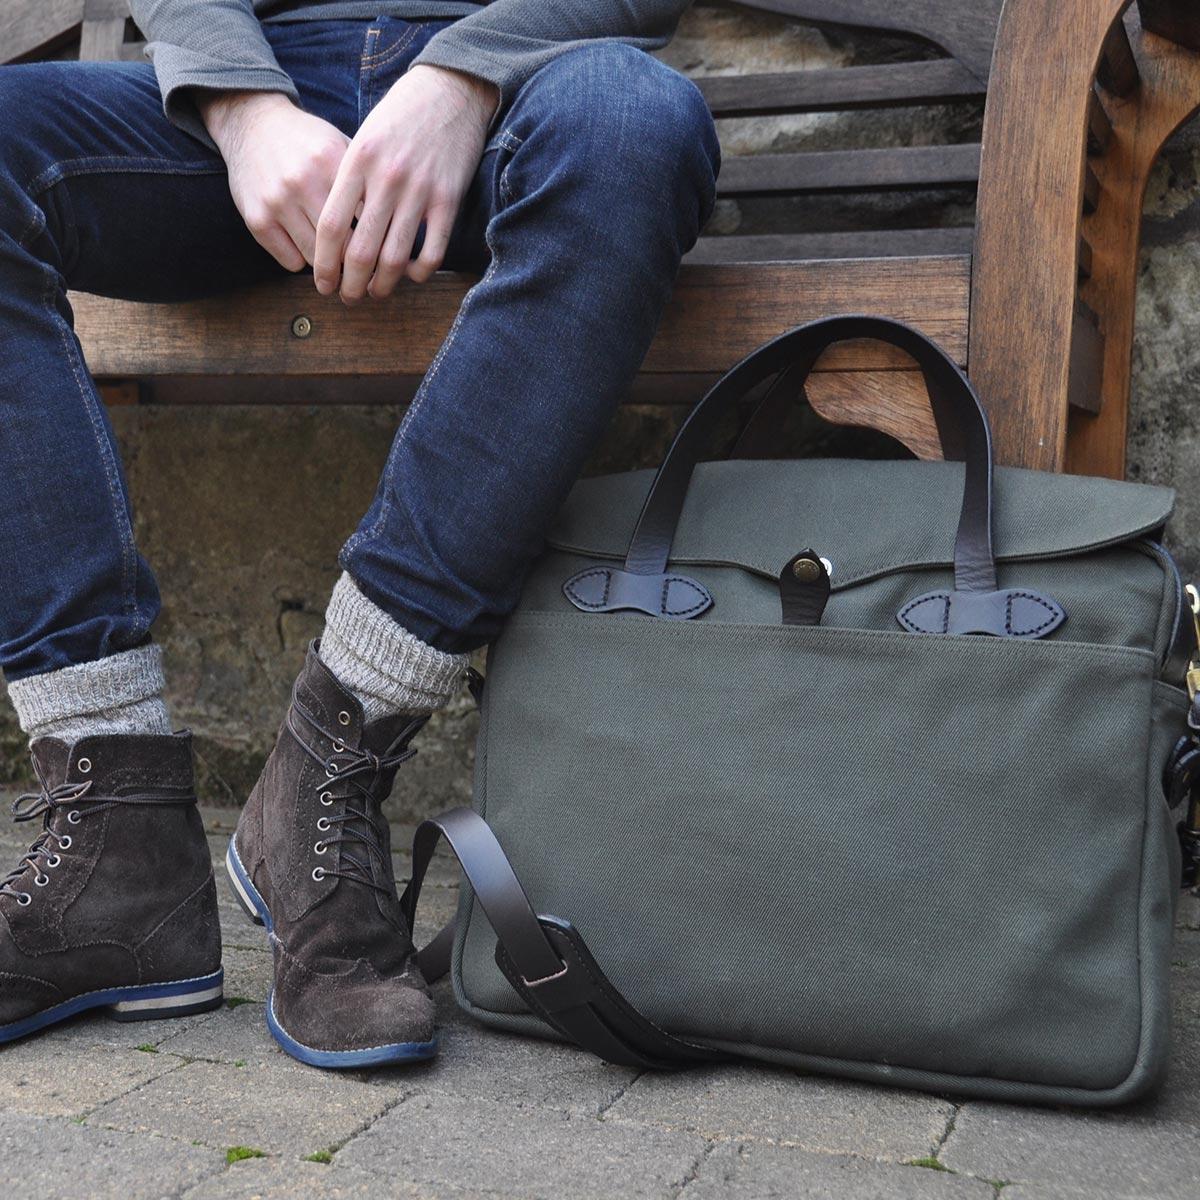 Filson Original Briefcase 11070256 Otter Green streetwear, past goed in een urban omgeving